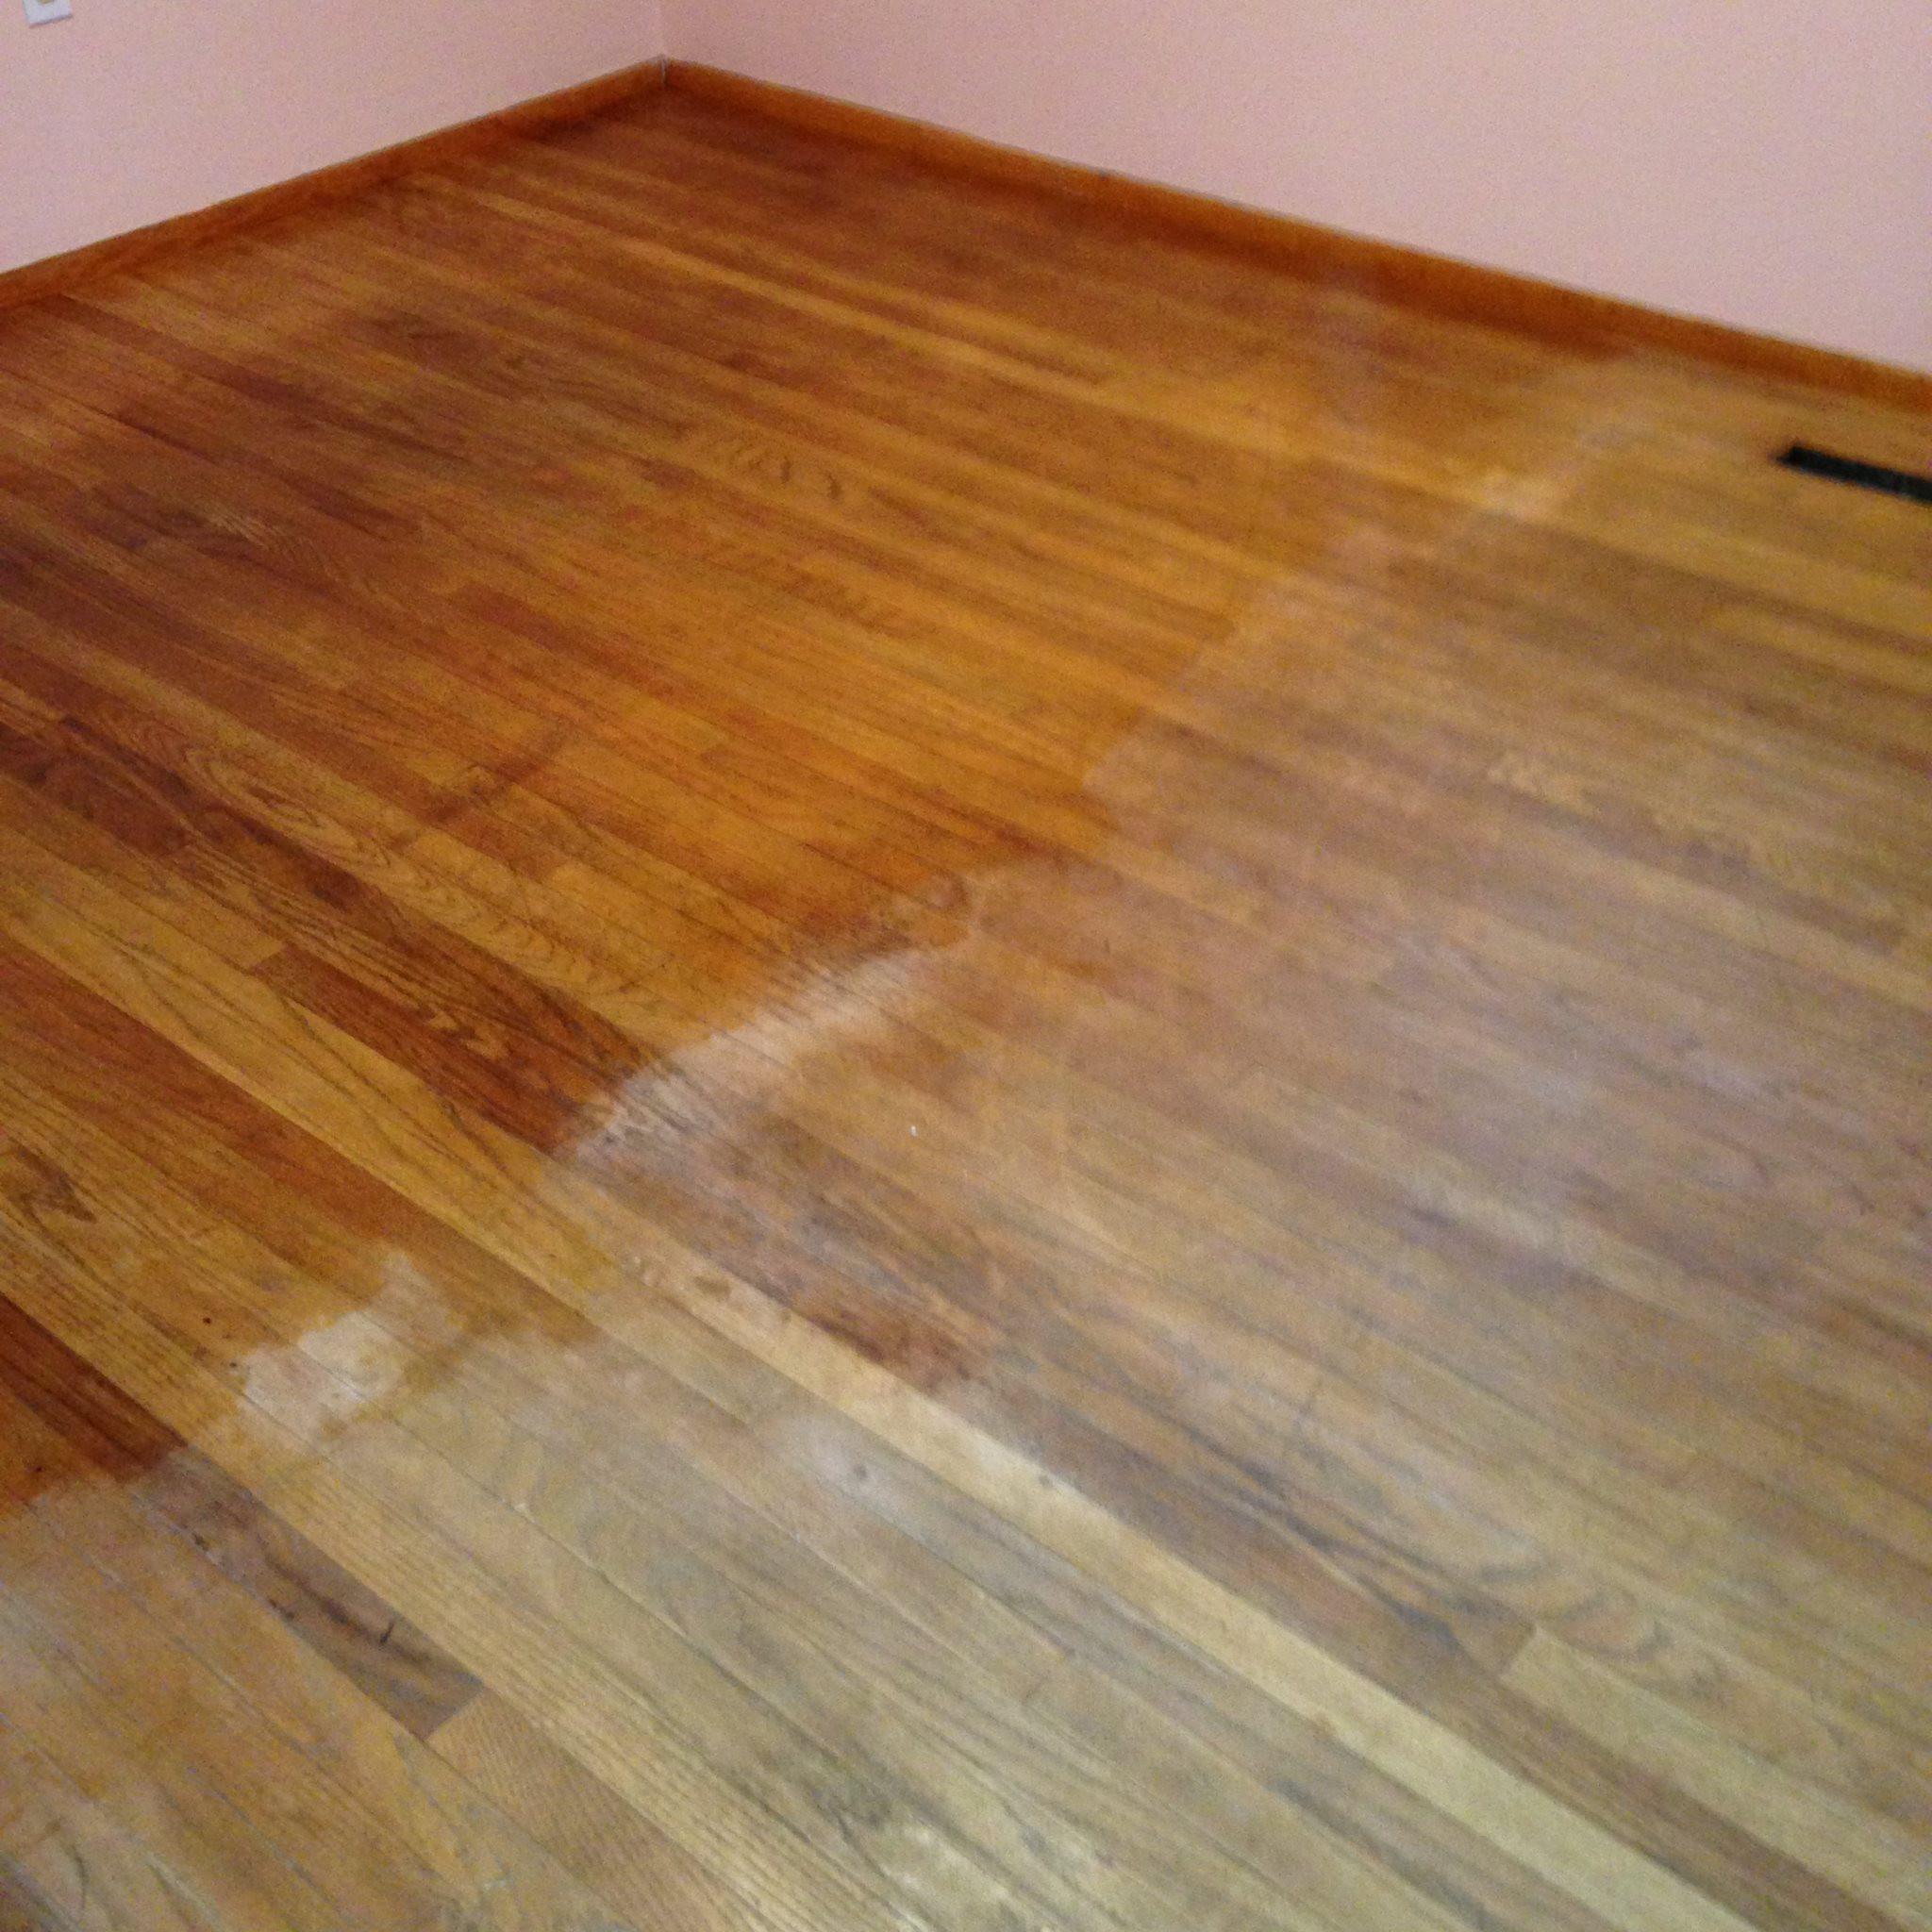 hardwood floor care scratches of 15 wood floor hacks every homeowner needs to know with wood floor hacks 15